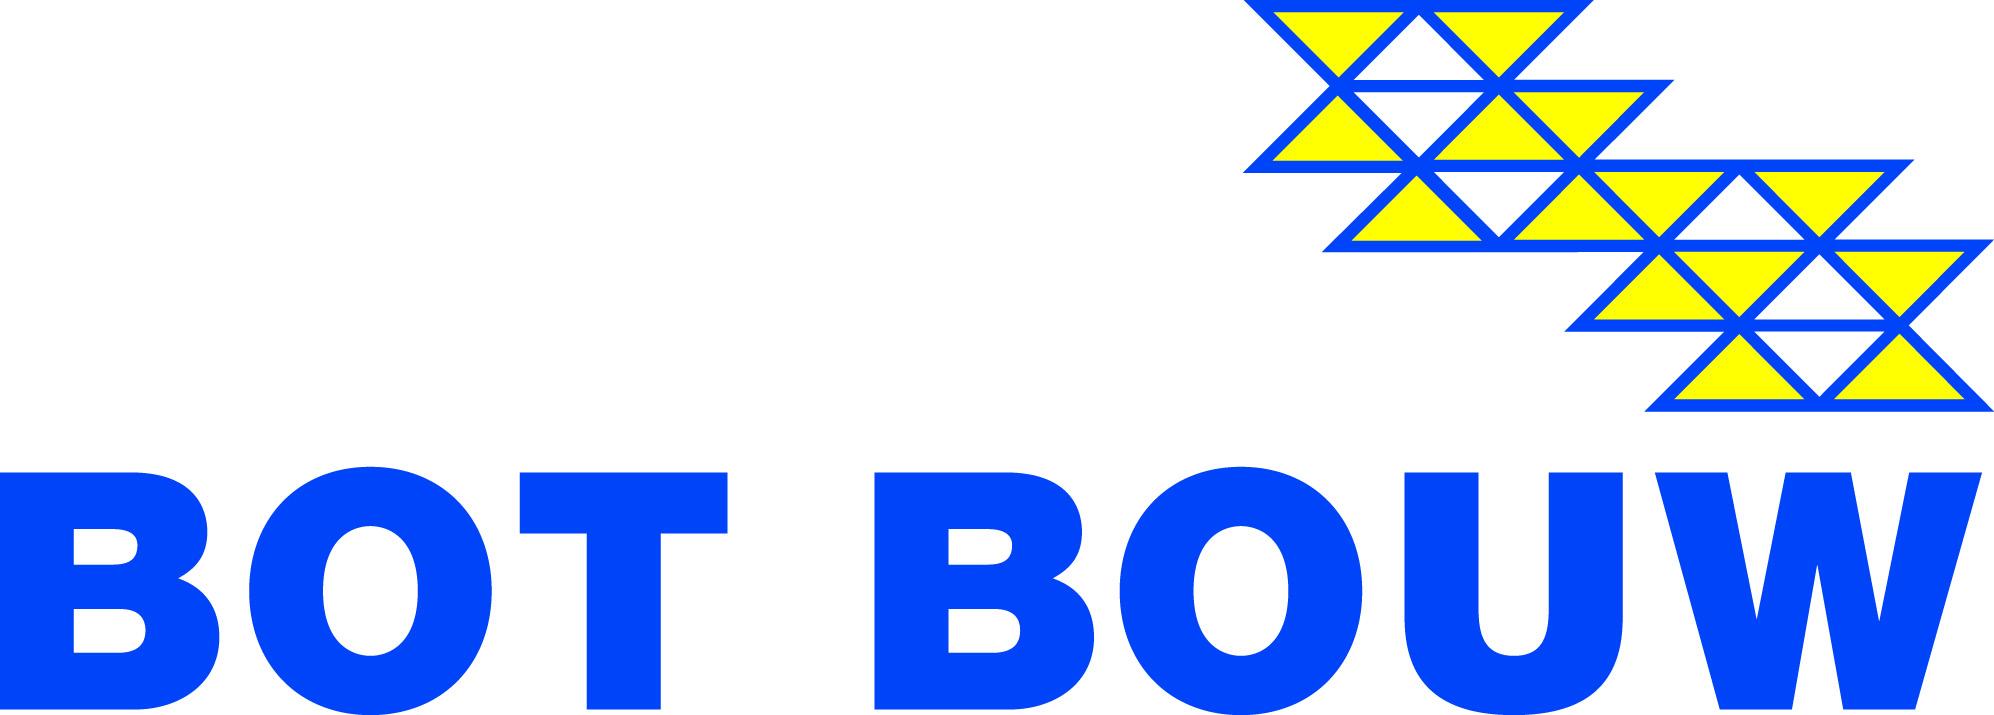 Bot Bouw Groep